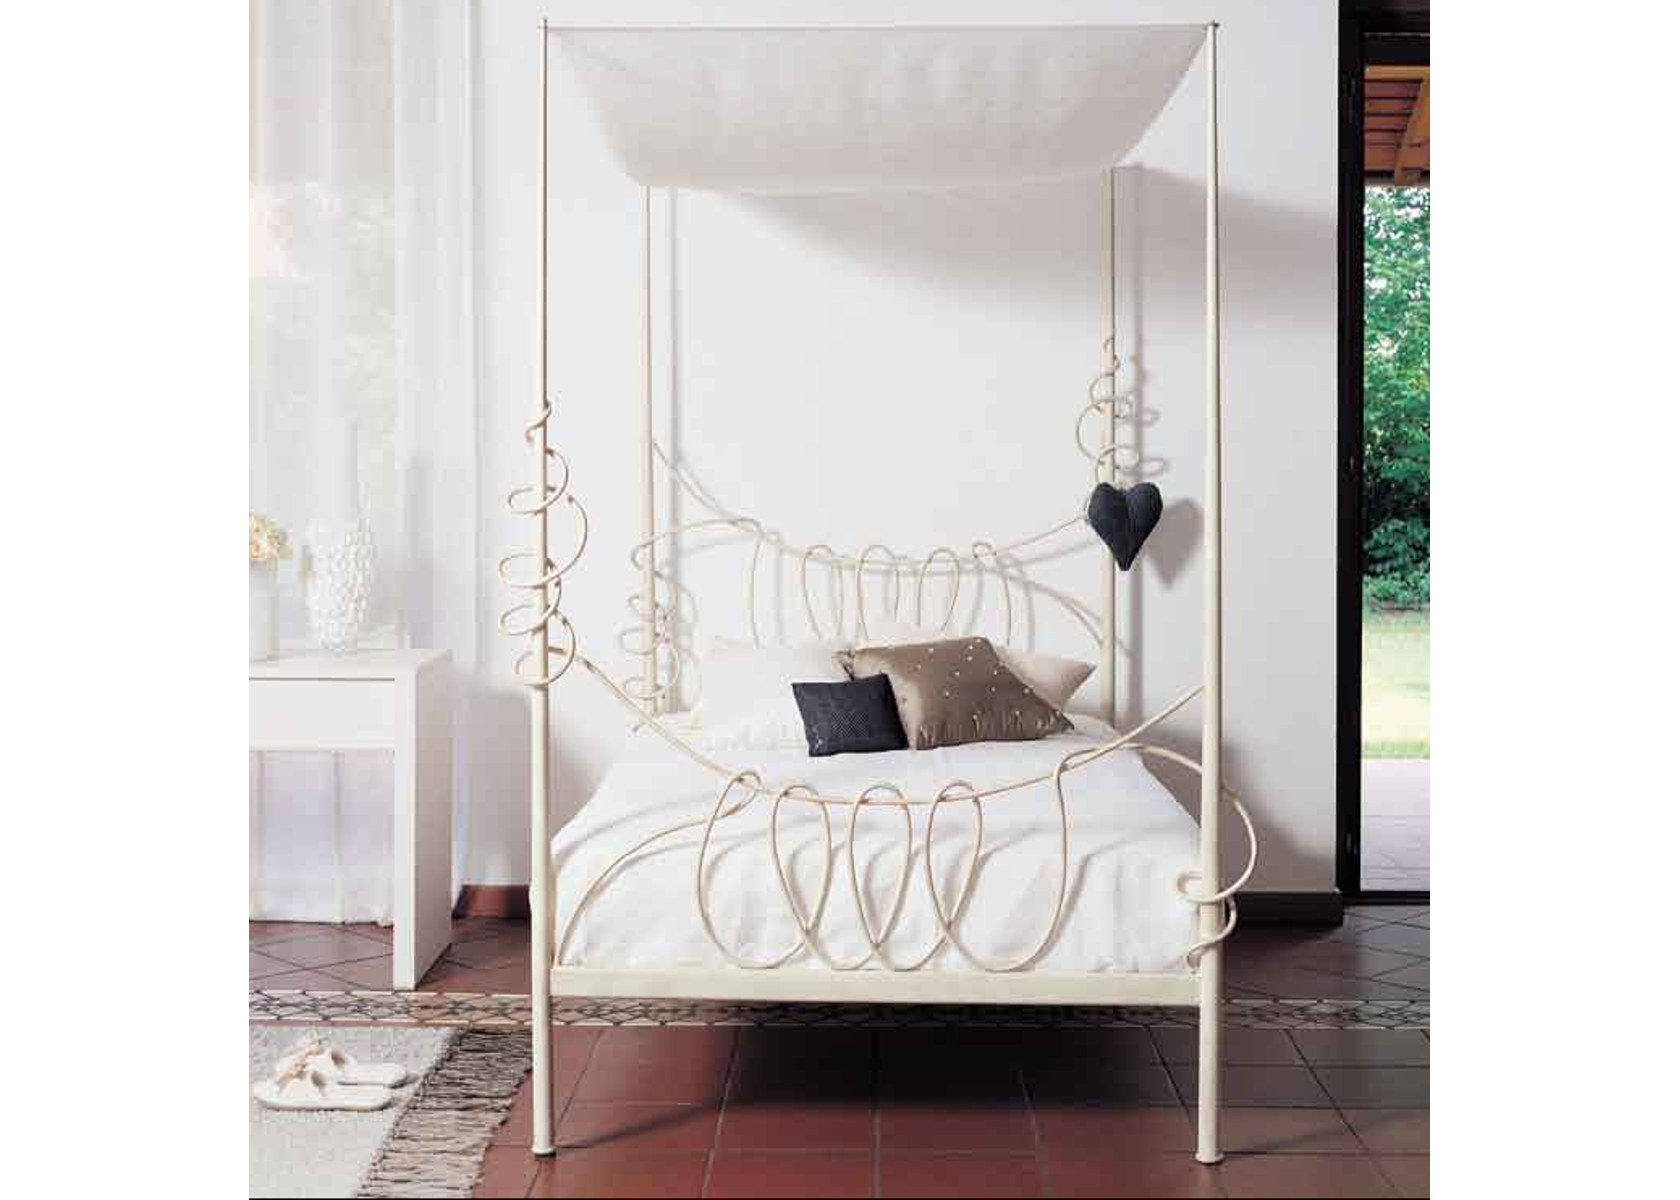 Full Size of Himmelbett 180x200 Metall Baby Ikea Set Englisch Kaufen Stange Mit Lattenrost Babybett Und Matratze Kinder Pamplona Metallbettenshop Sofa Bettkasten Bett Bett Himmel Bett